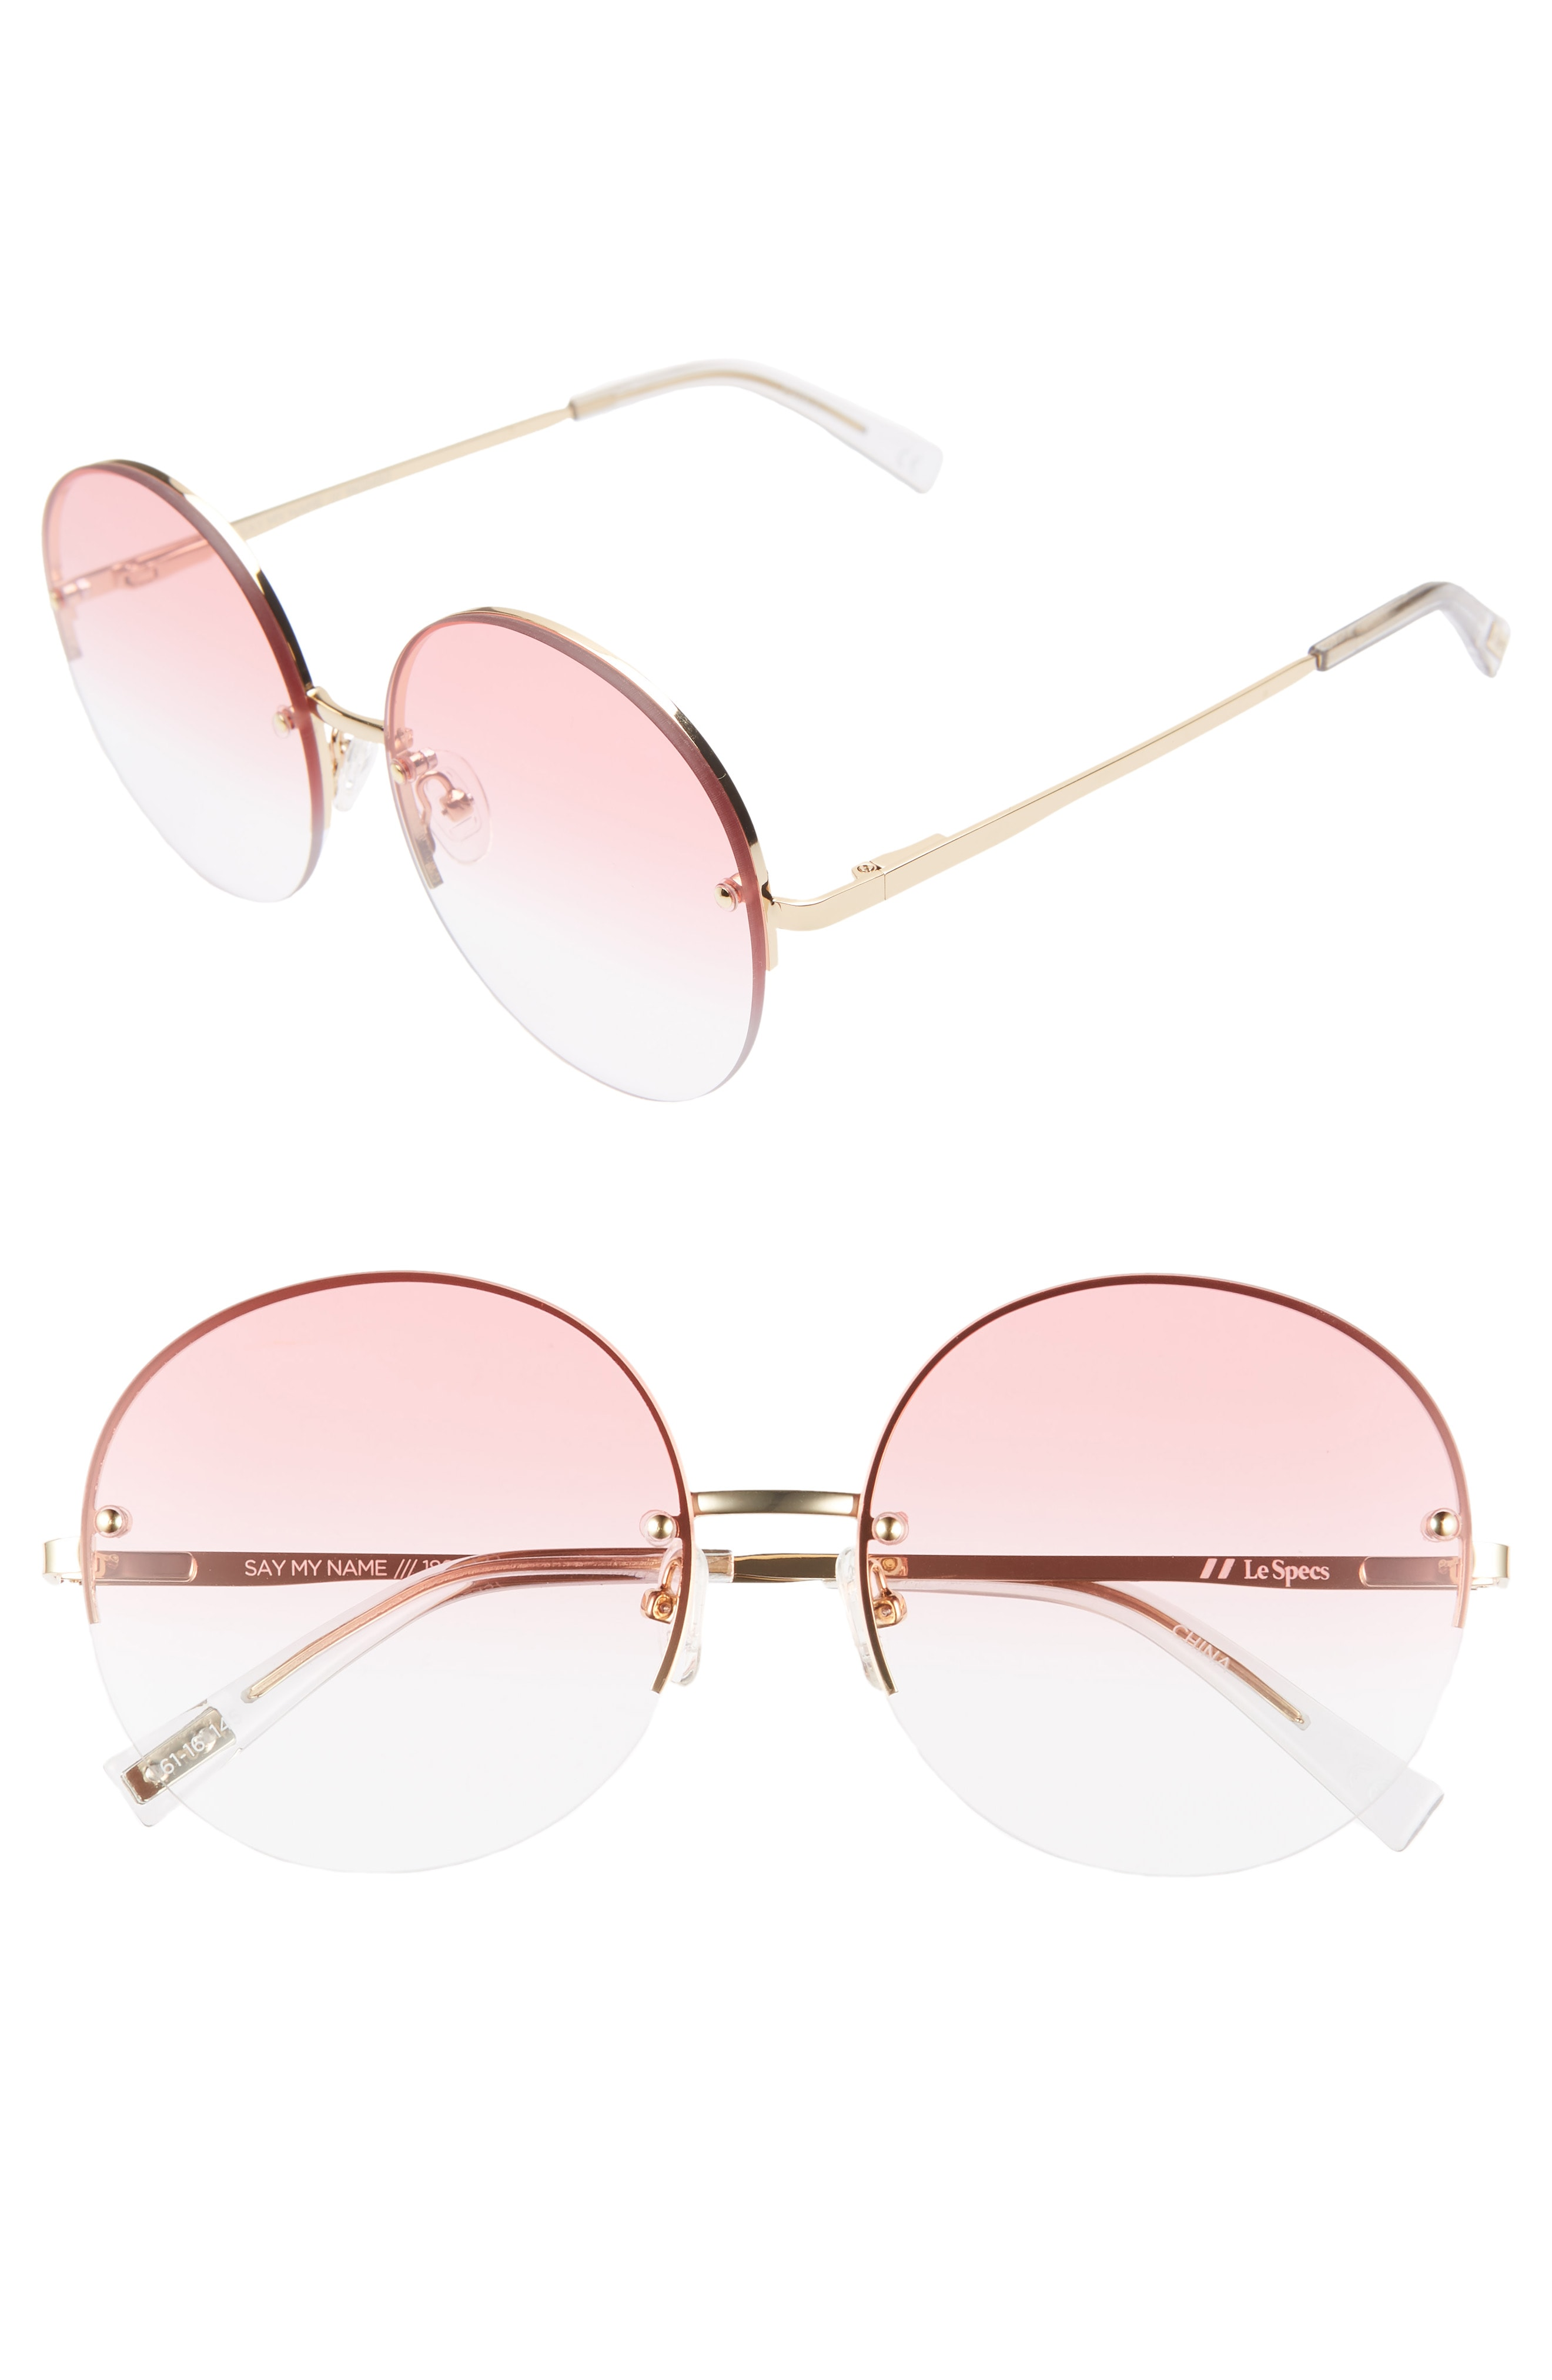 Le Specs Say My Name 61mm Semi Rimless Round Sunglasses